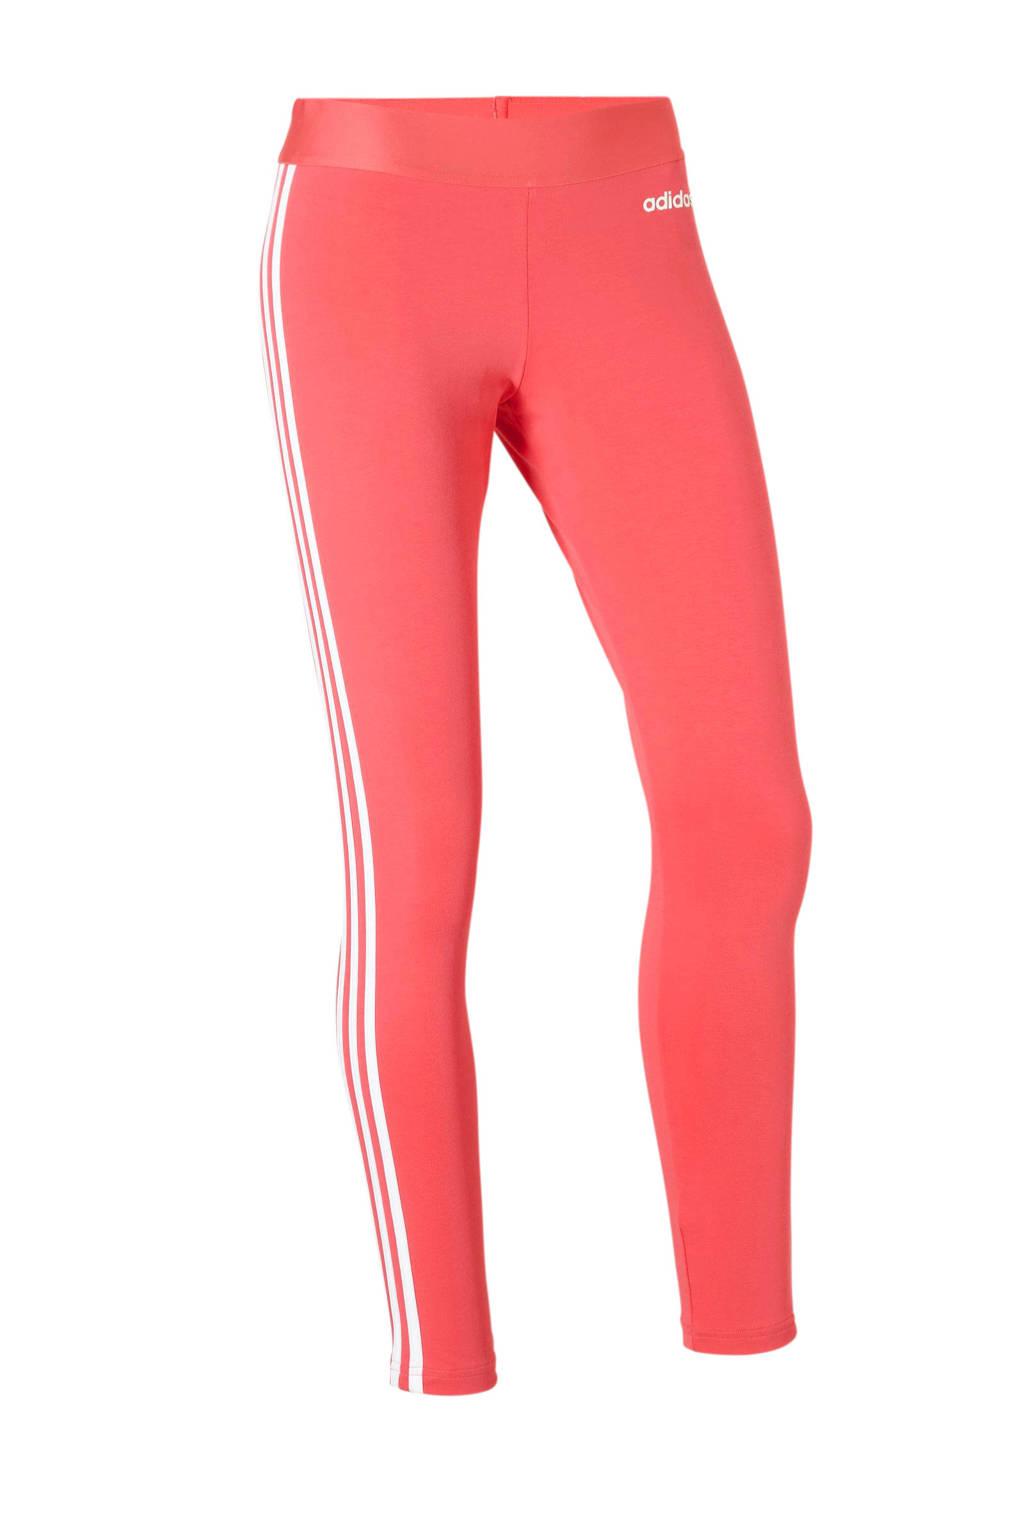 adidas performance sportbroek roze, Roze/wit